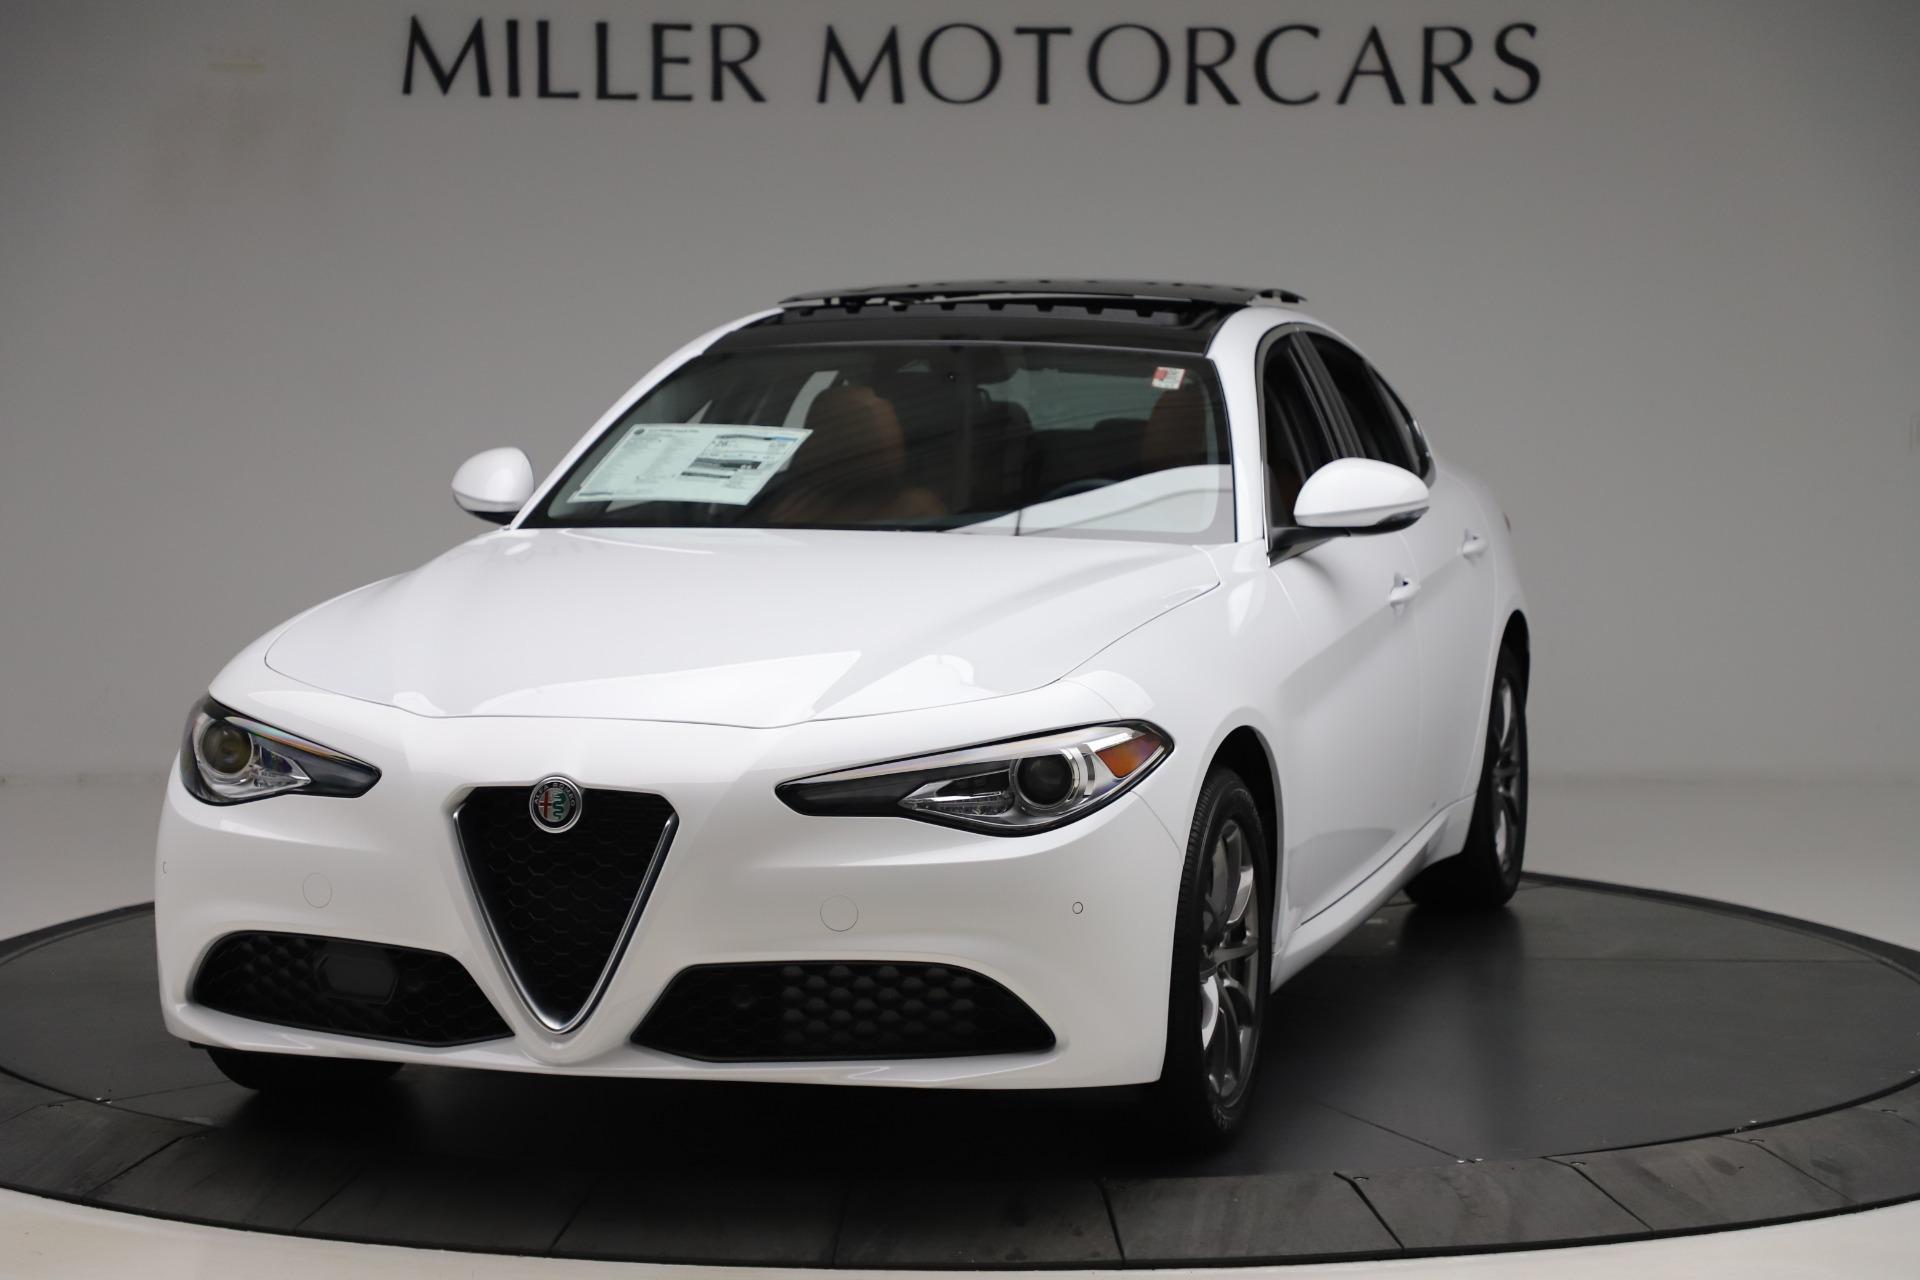 New 2020 Alfa Romeo Giulia Q4 For Sale ($45.590) | Alfa Romeo of Westport Stock #LW404